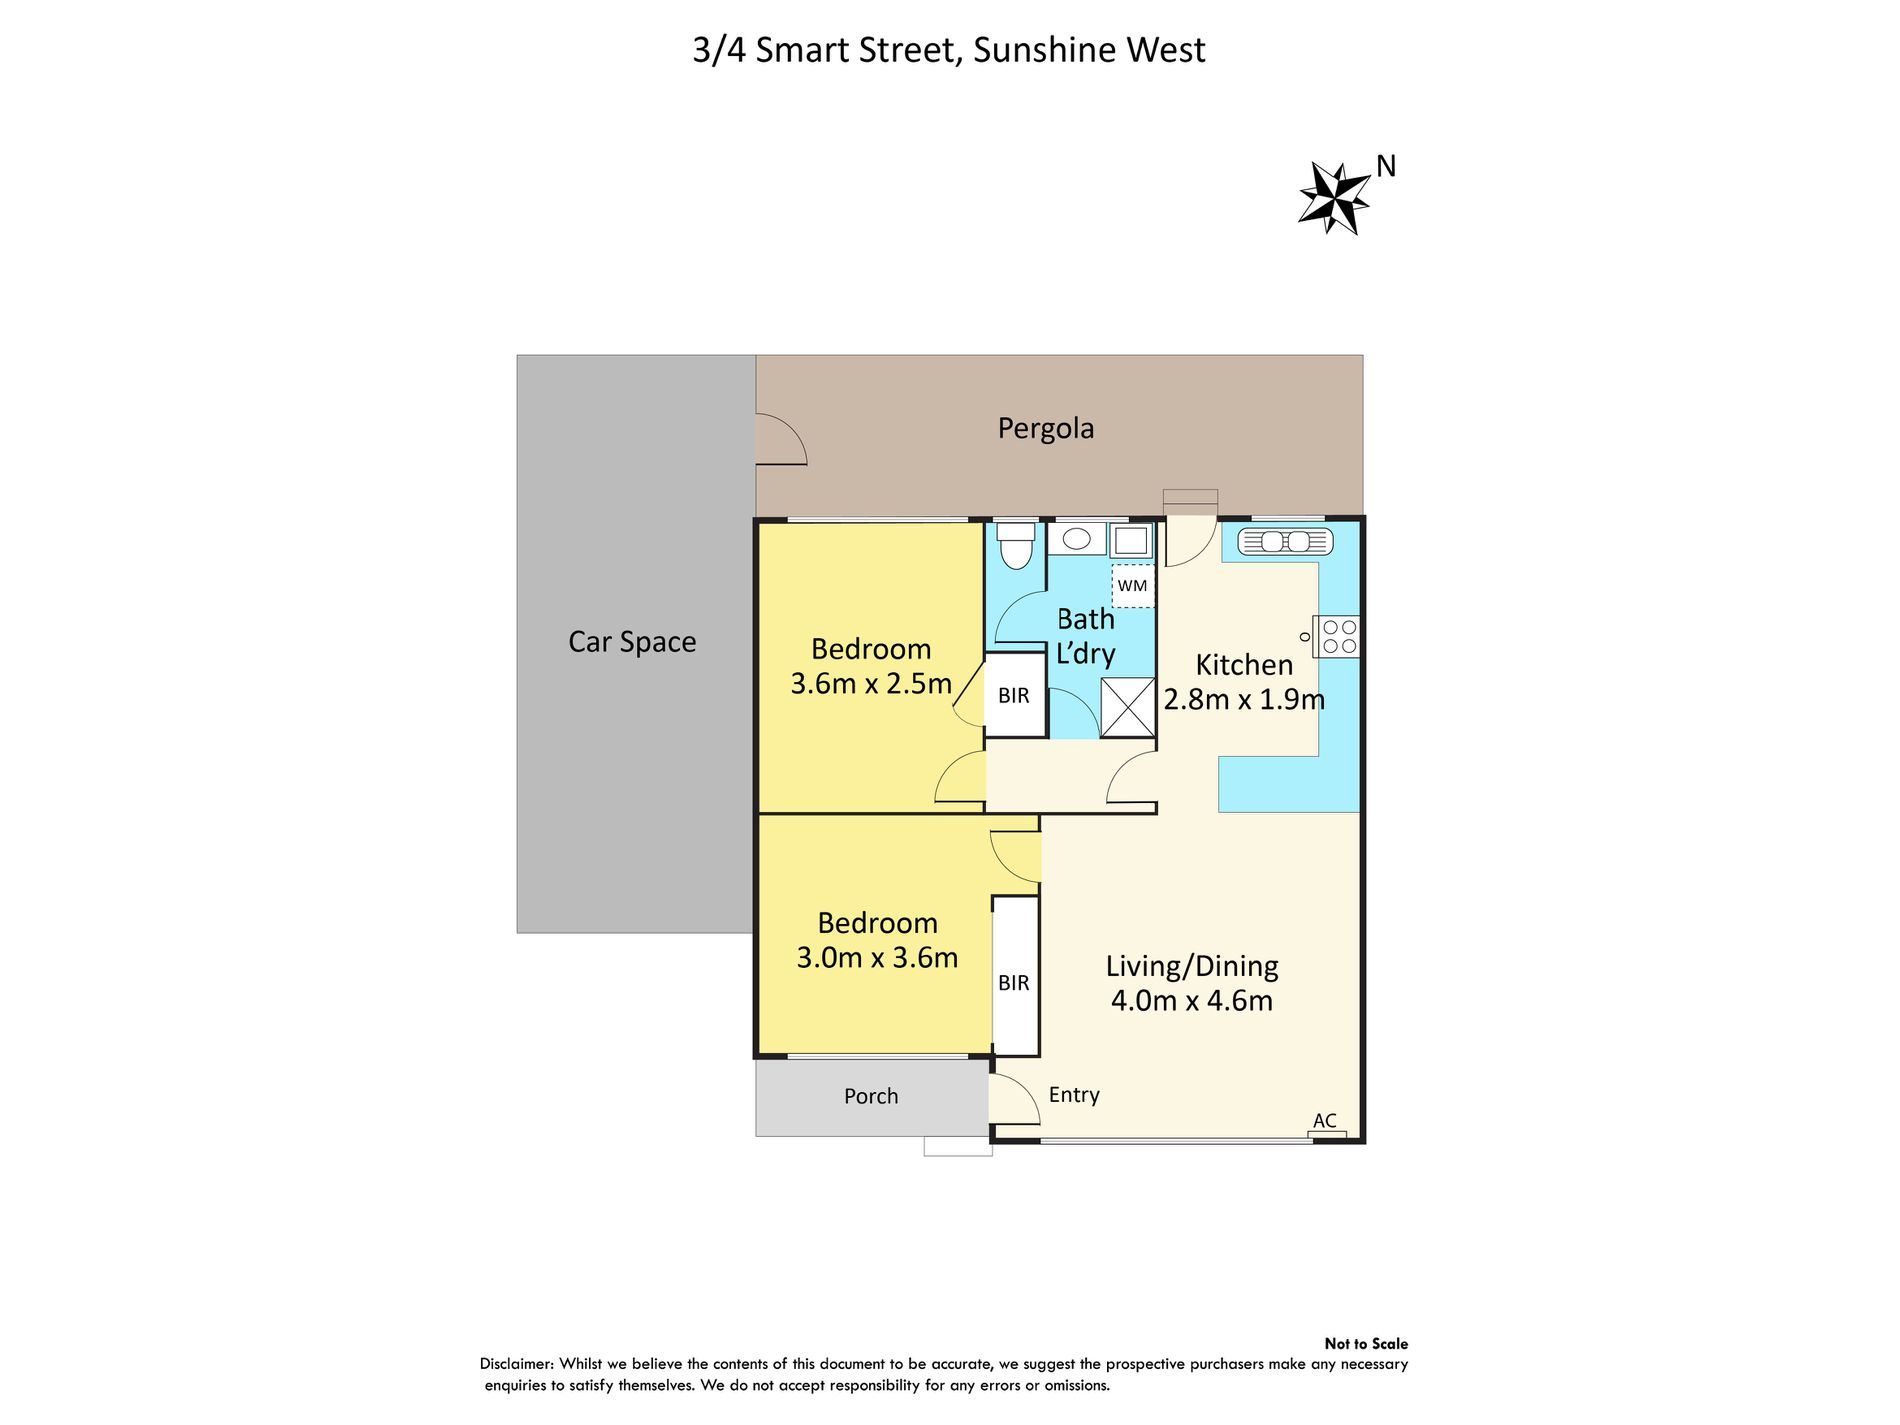 3 / 4 Smart Street, Sunshine West